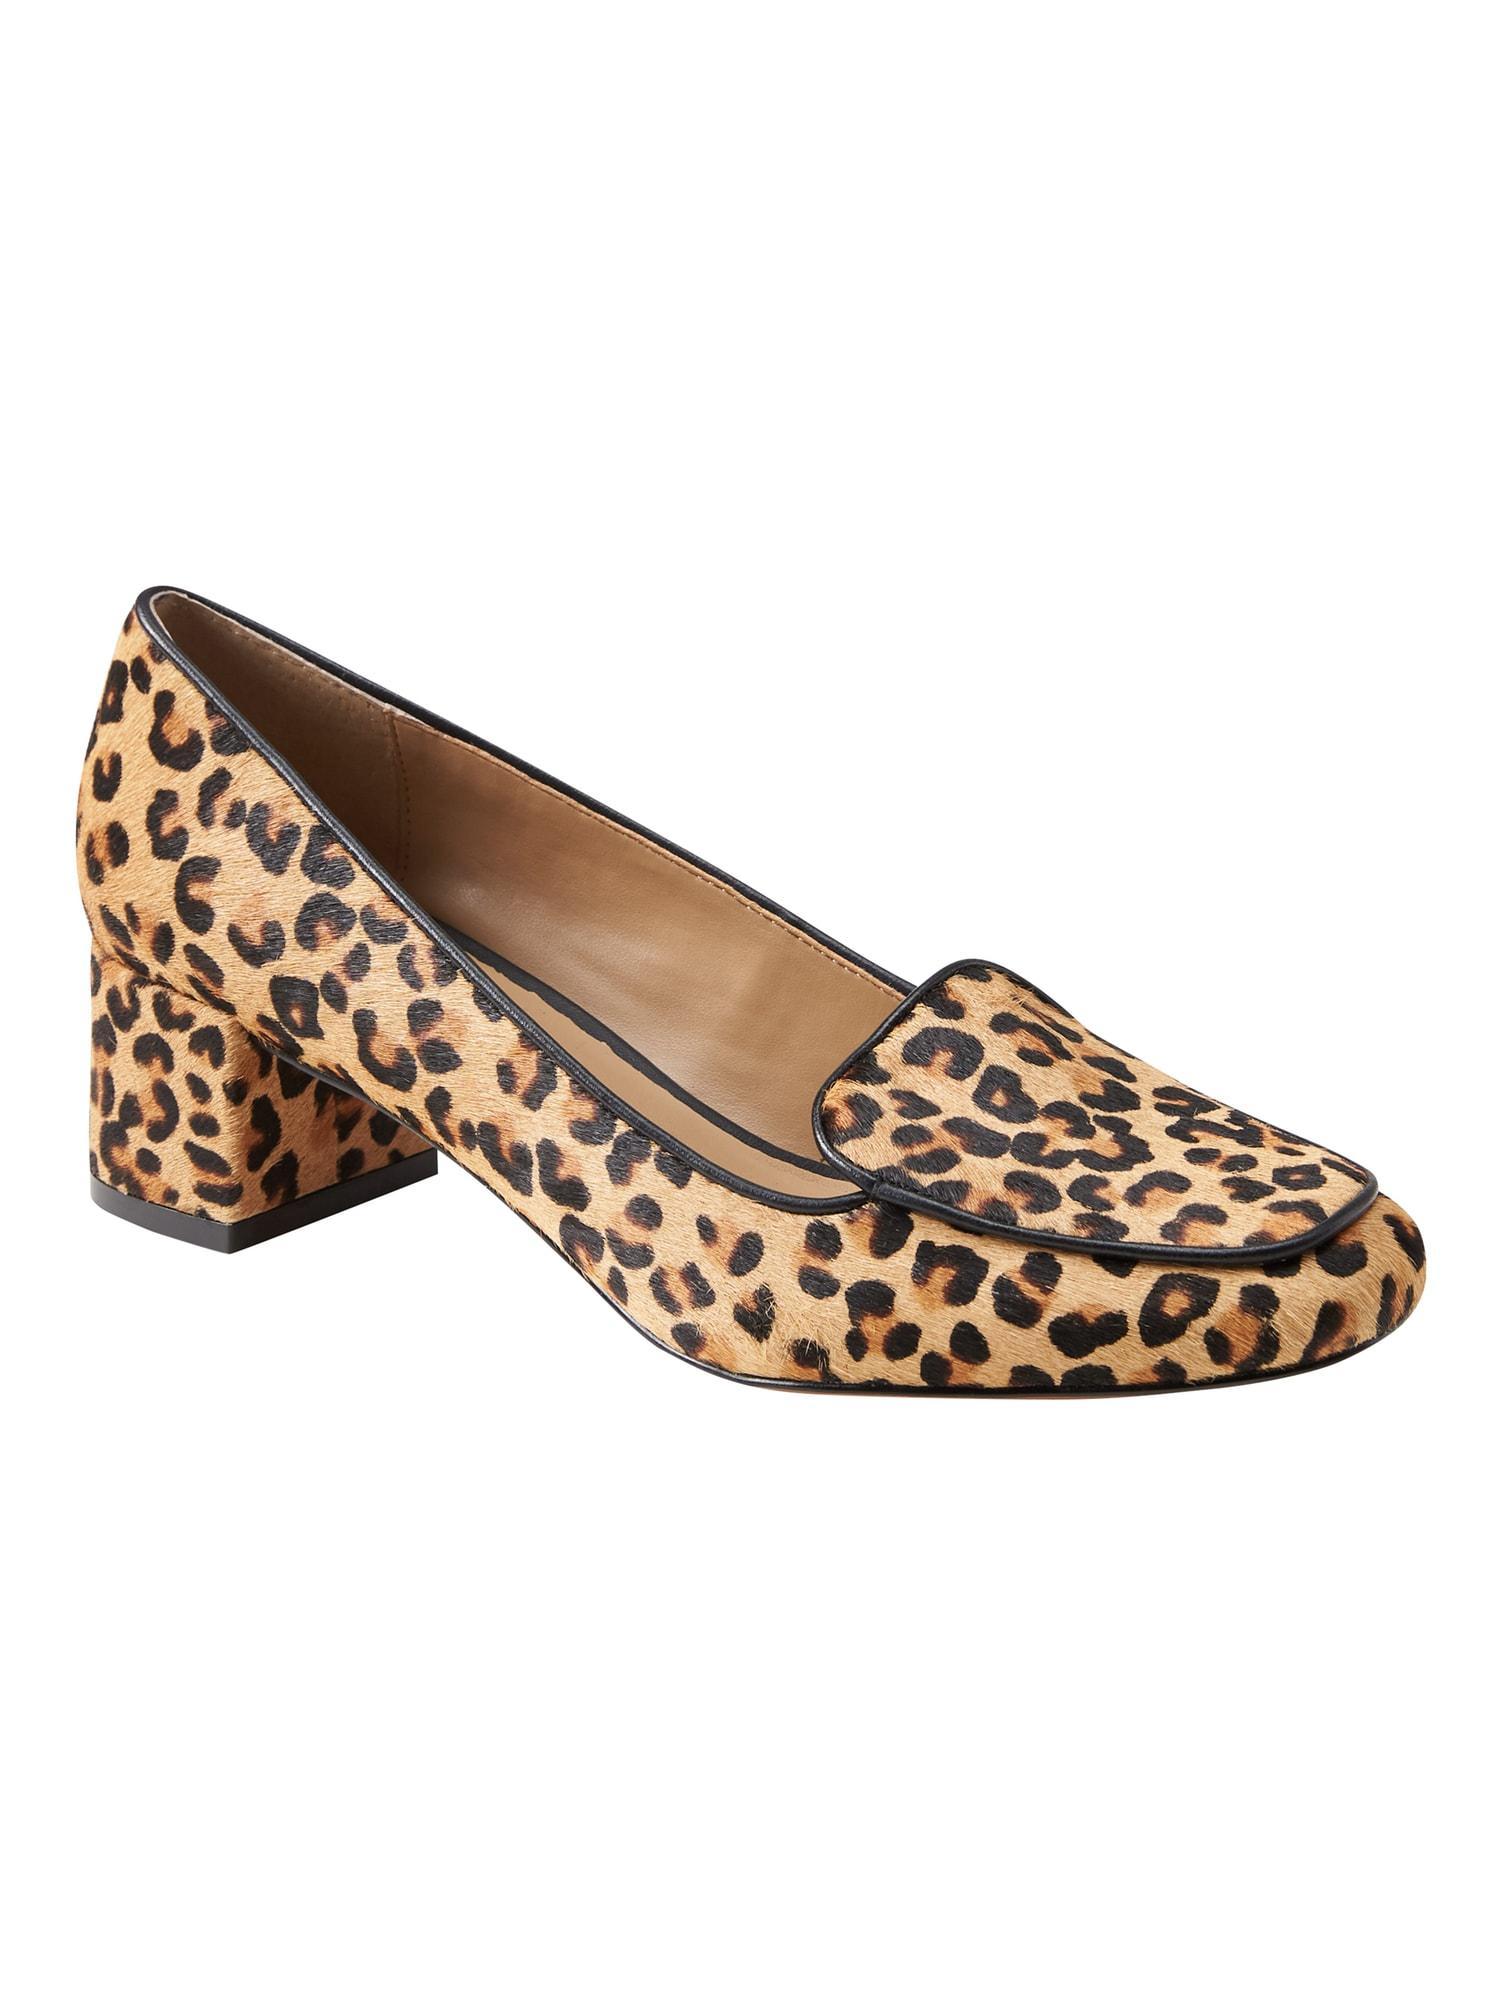 e98f520d423 Lyst - Banana Republic Low Block-heel Leopard Print Loafer in Brown